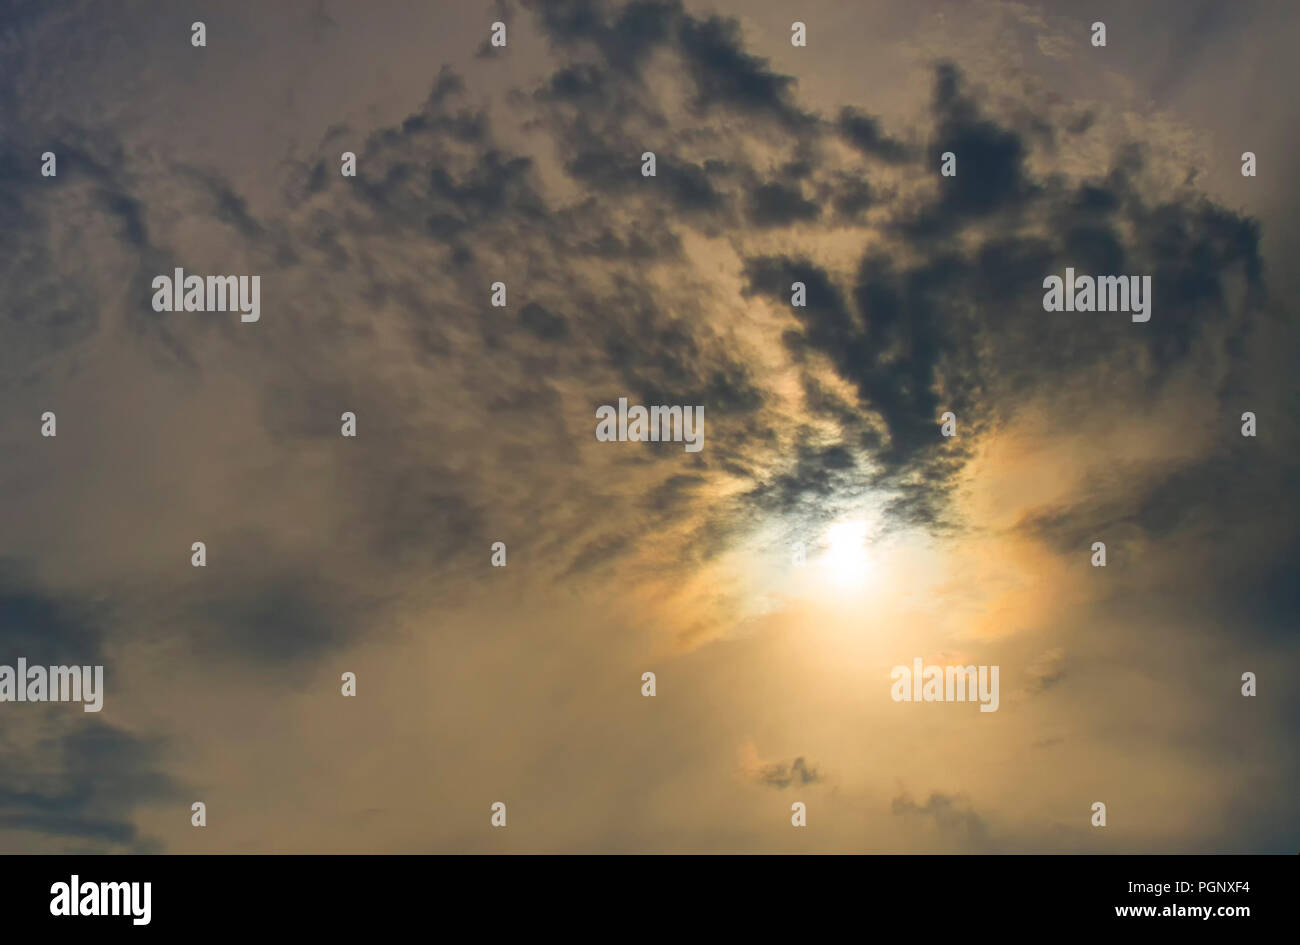 Sun rising behind the dark clouds, dark orange tone. Stock Photo